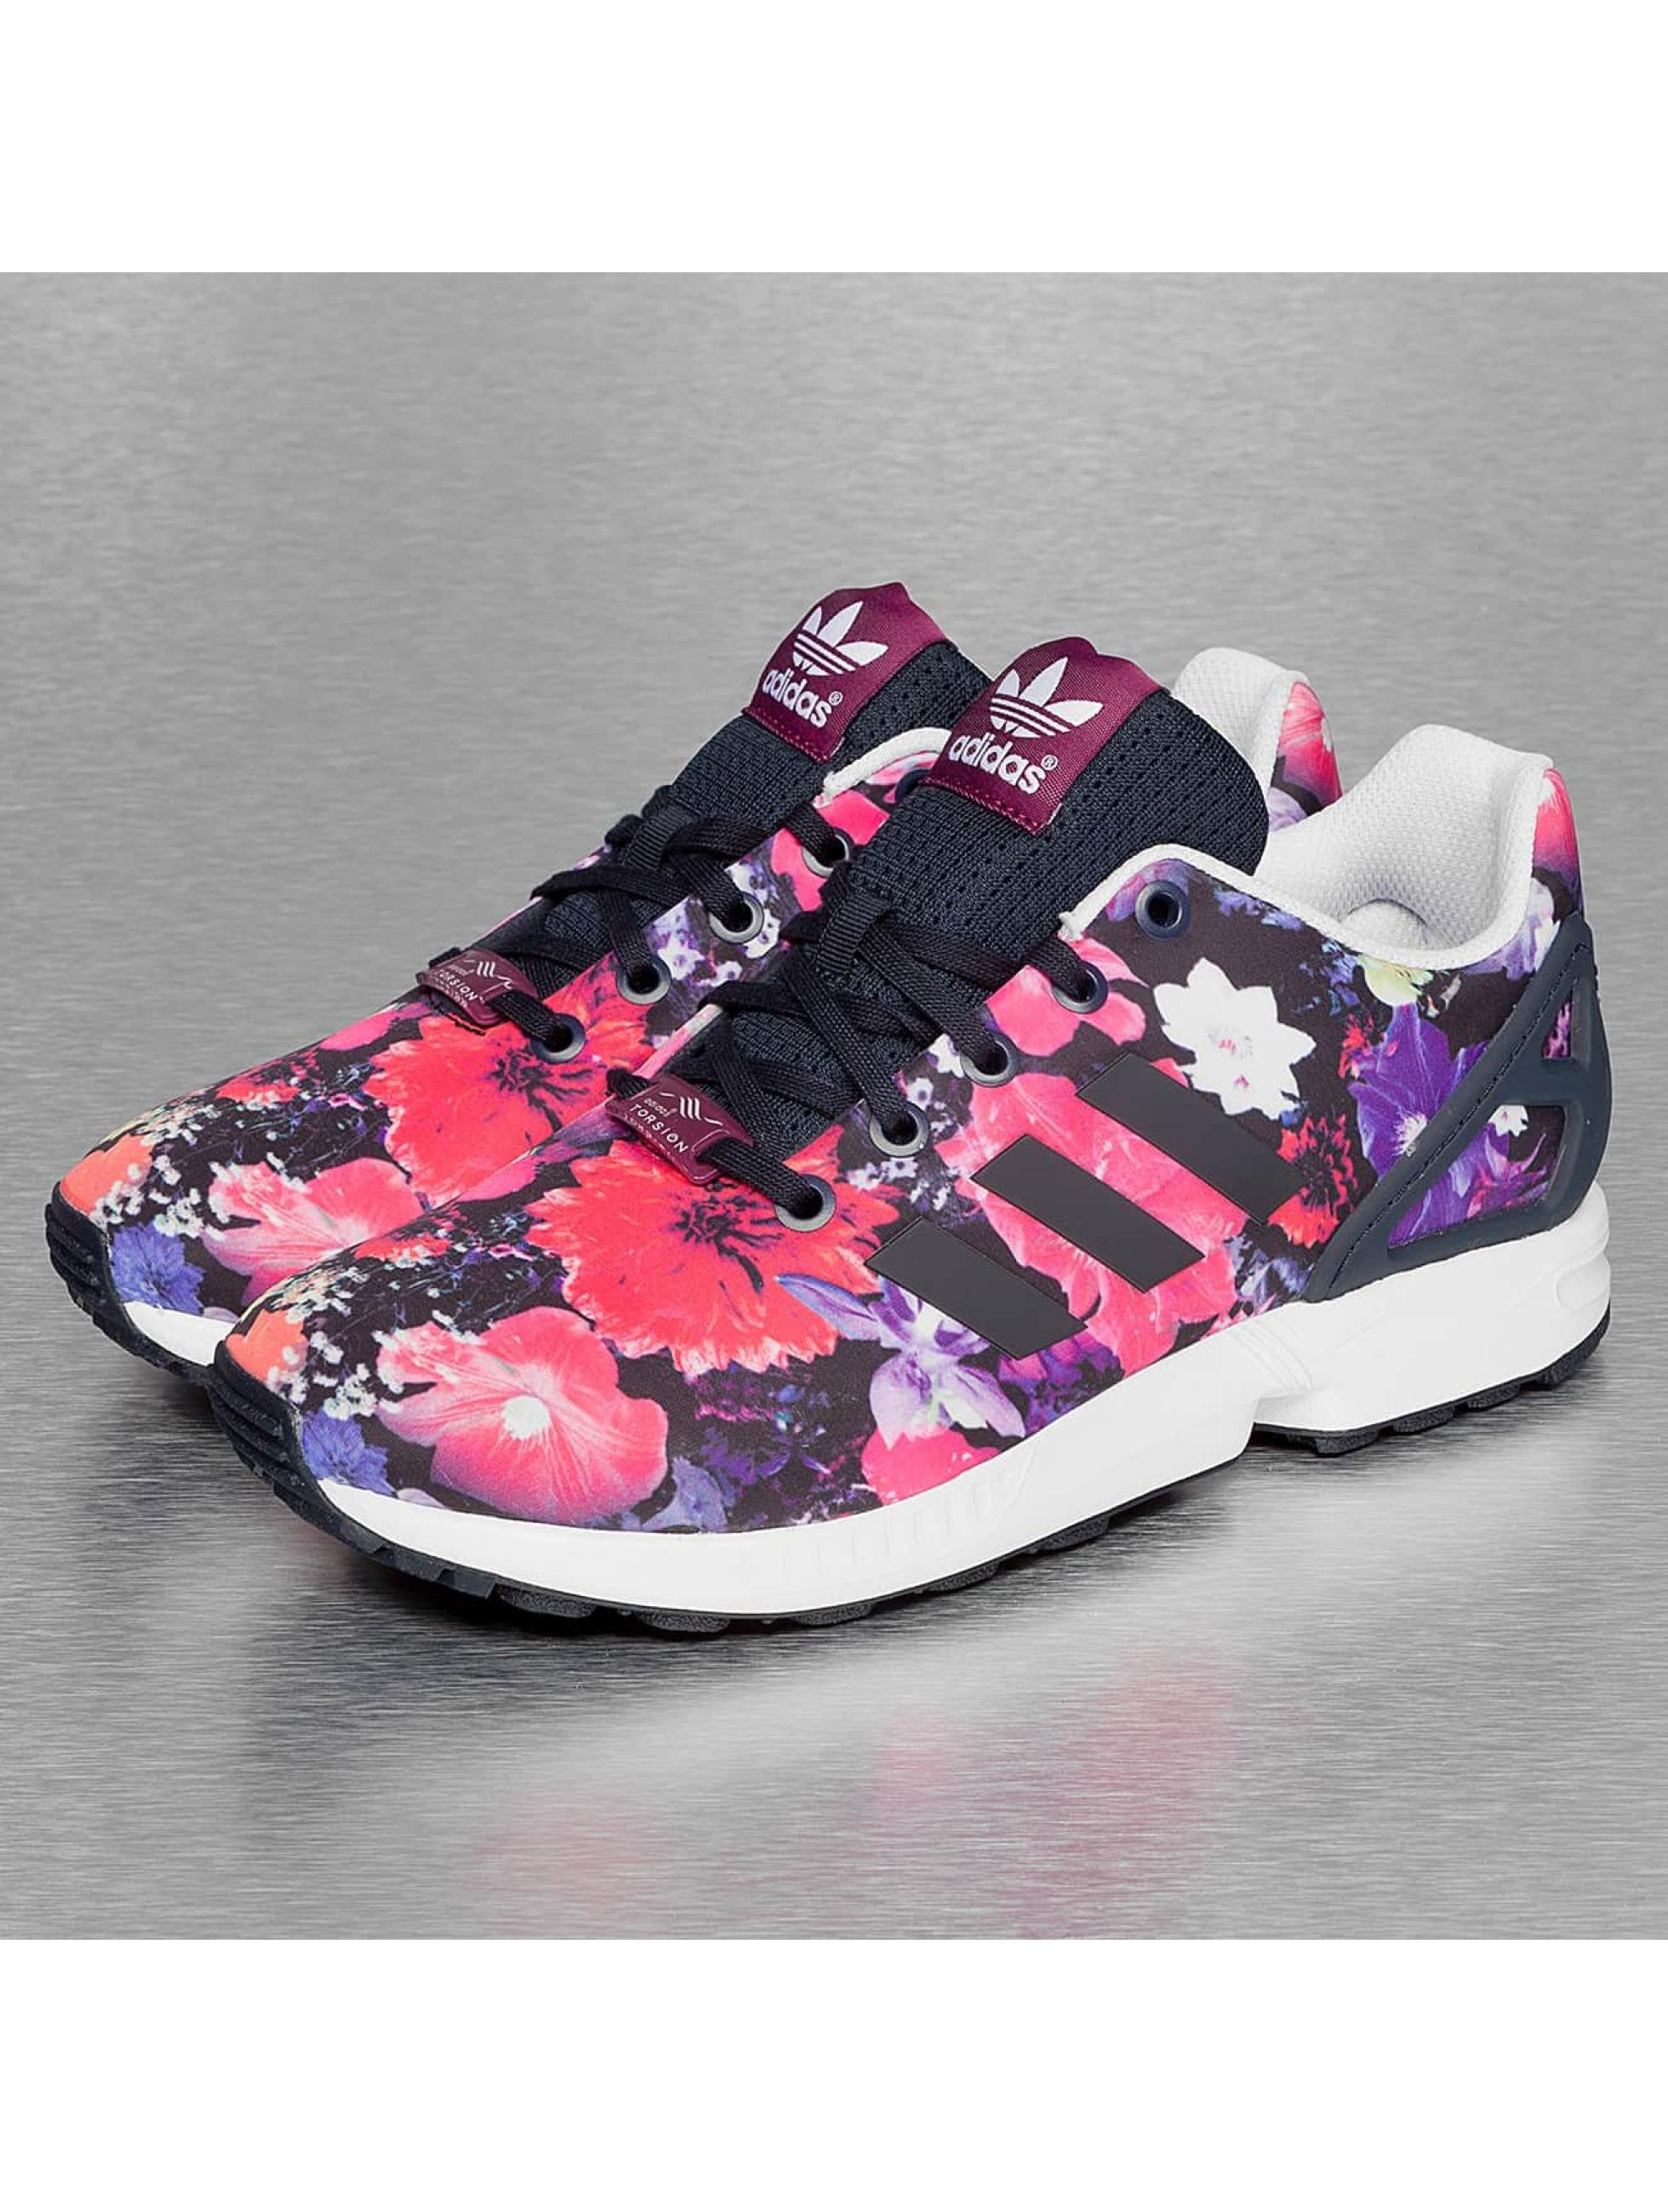 adidas chaussures baskets zx flux en multicolore 222038. Black Bedroom Furniture Sets. Home Design Ideas